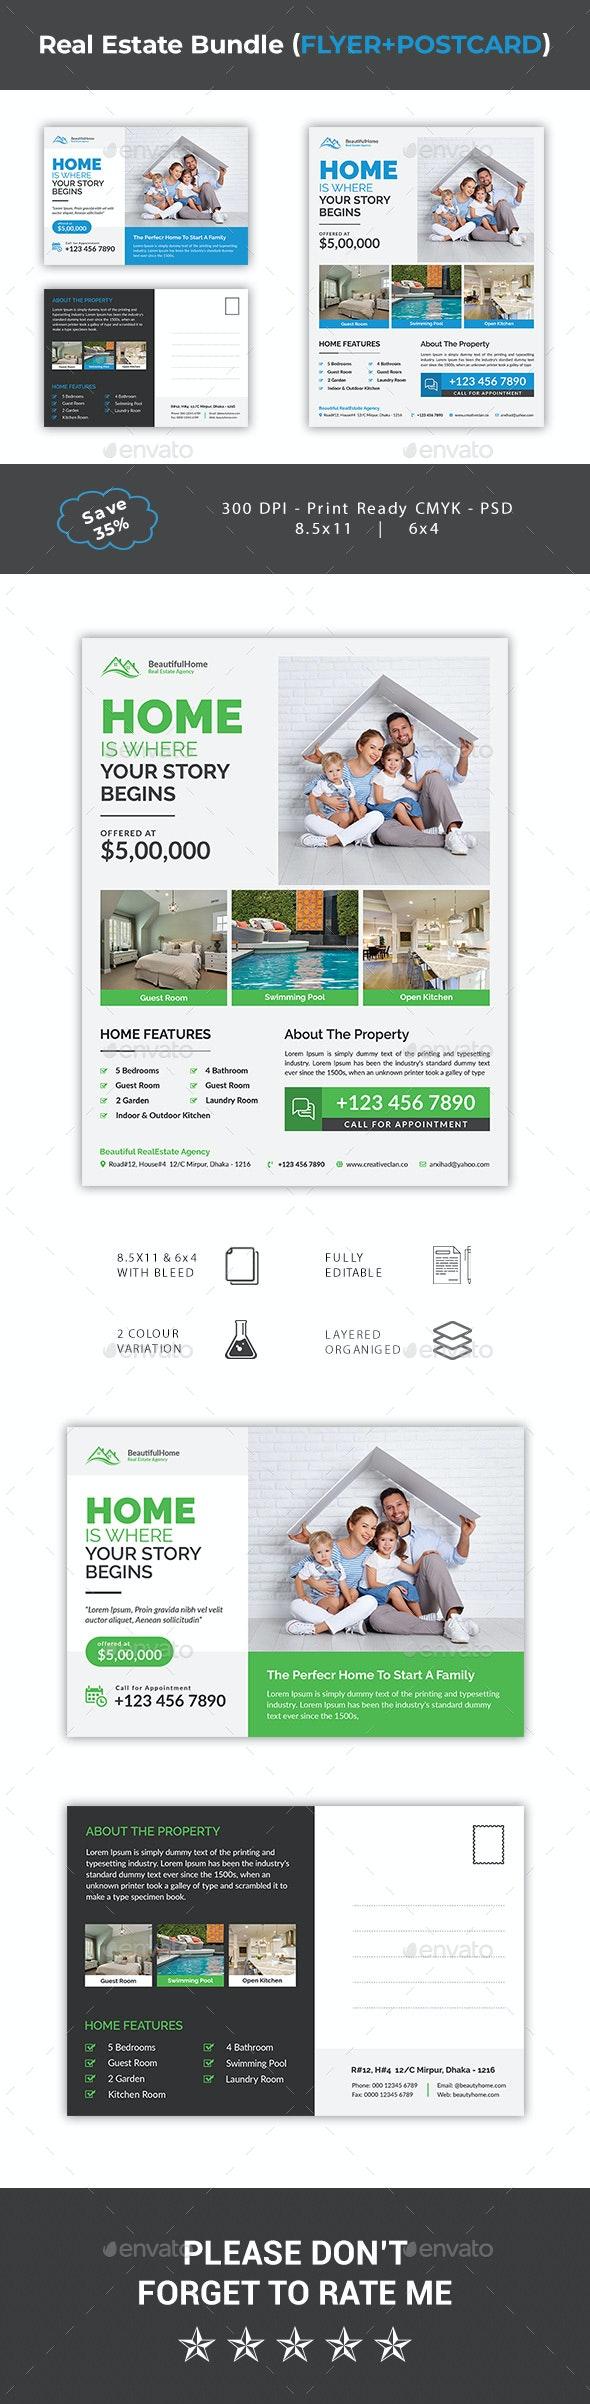 Real Estate Flyer & Post Card Bundle - Corporate Flyers